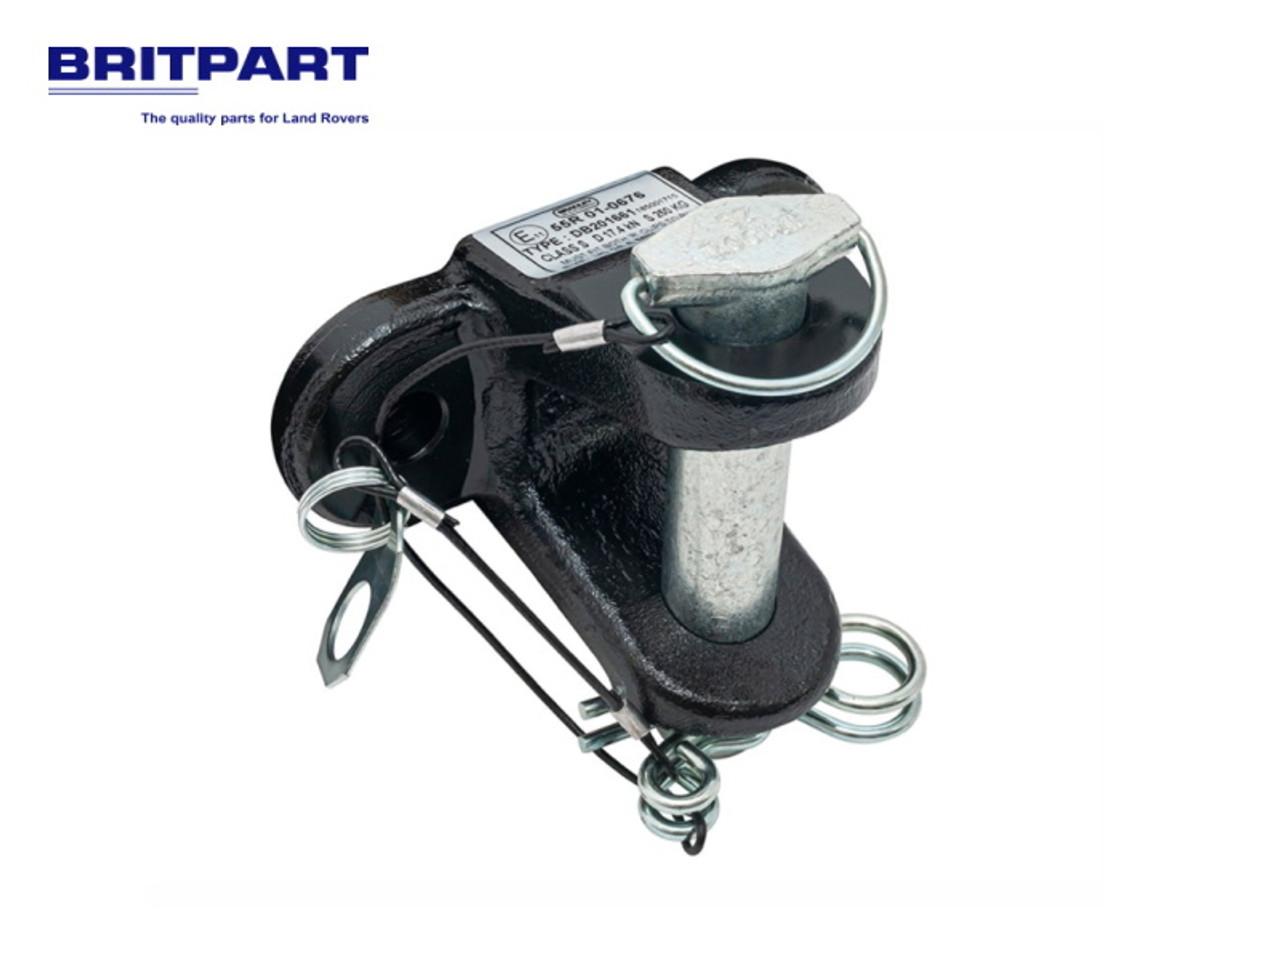 Britpart 3.5 Ton Dixon Bate Towing Jaw - KNB100640G